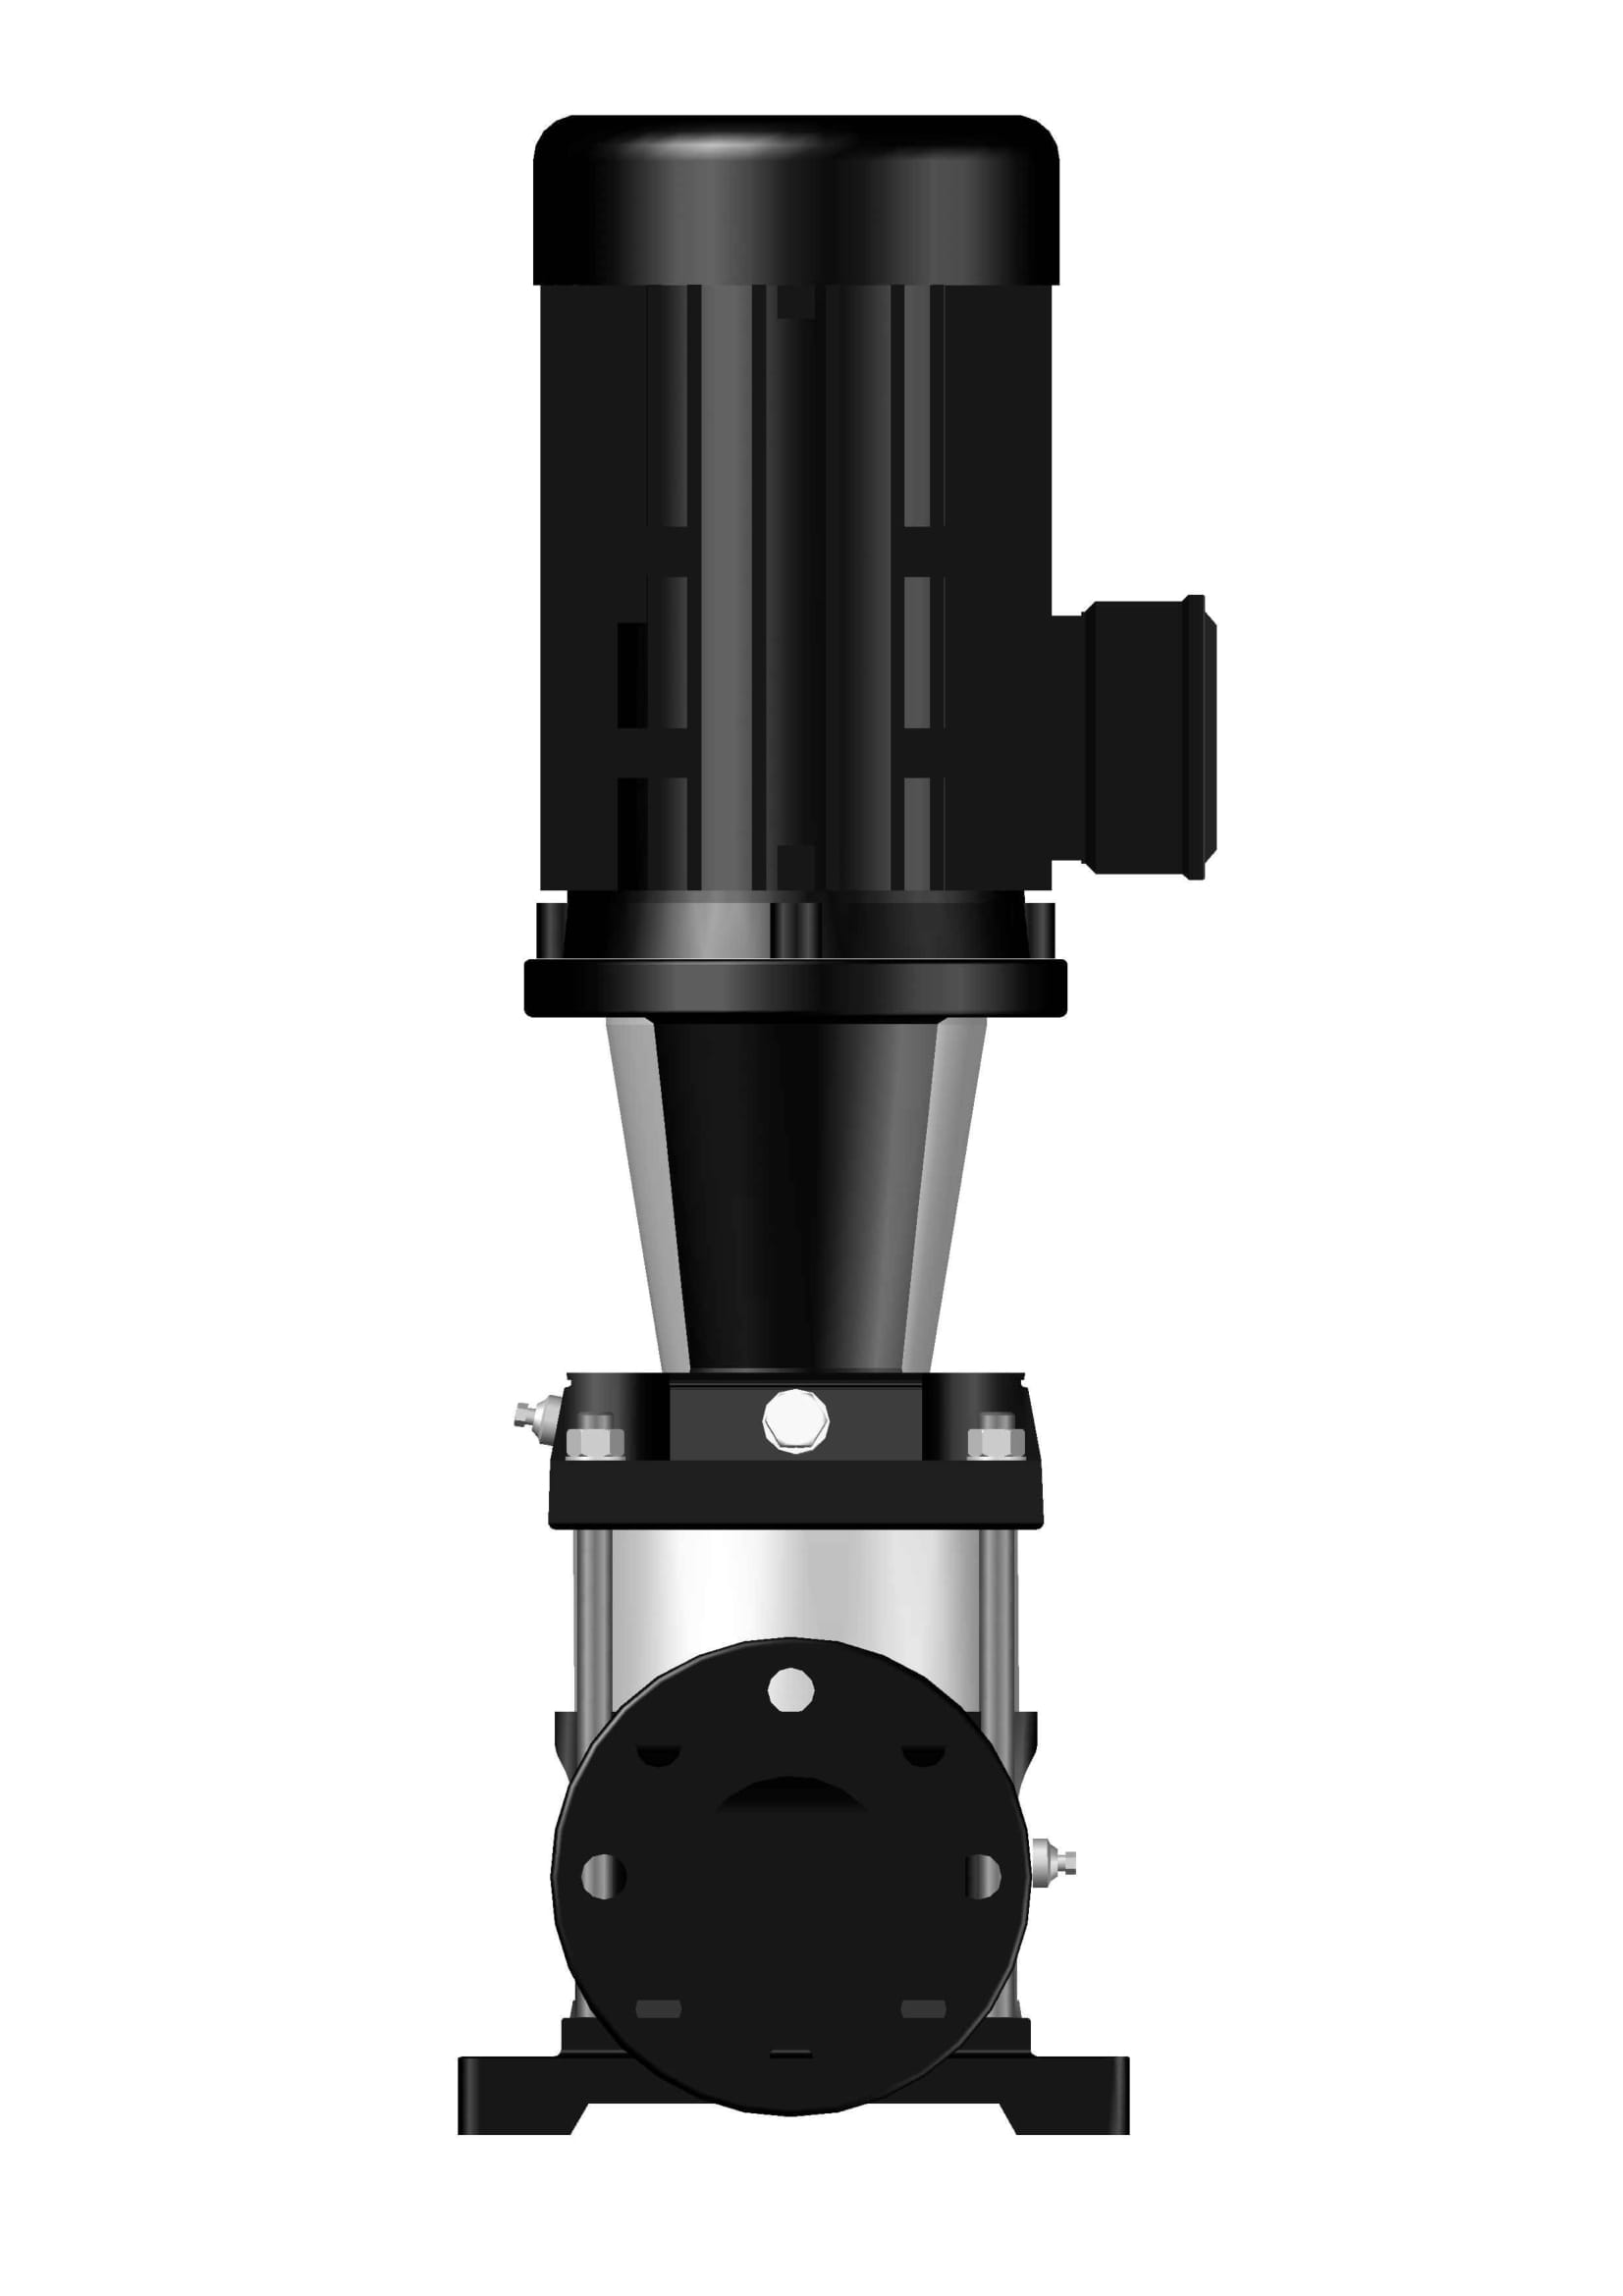 BV 90-01-01